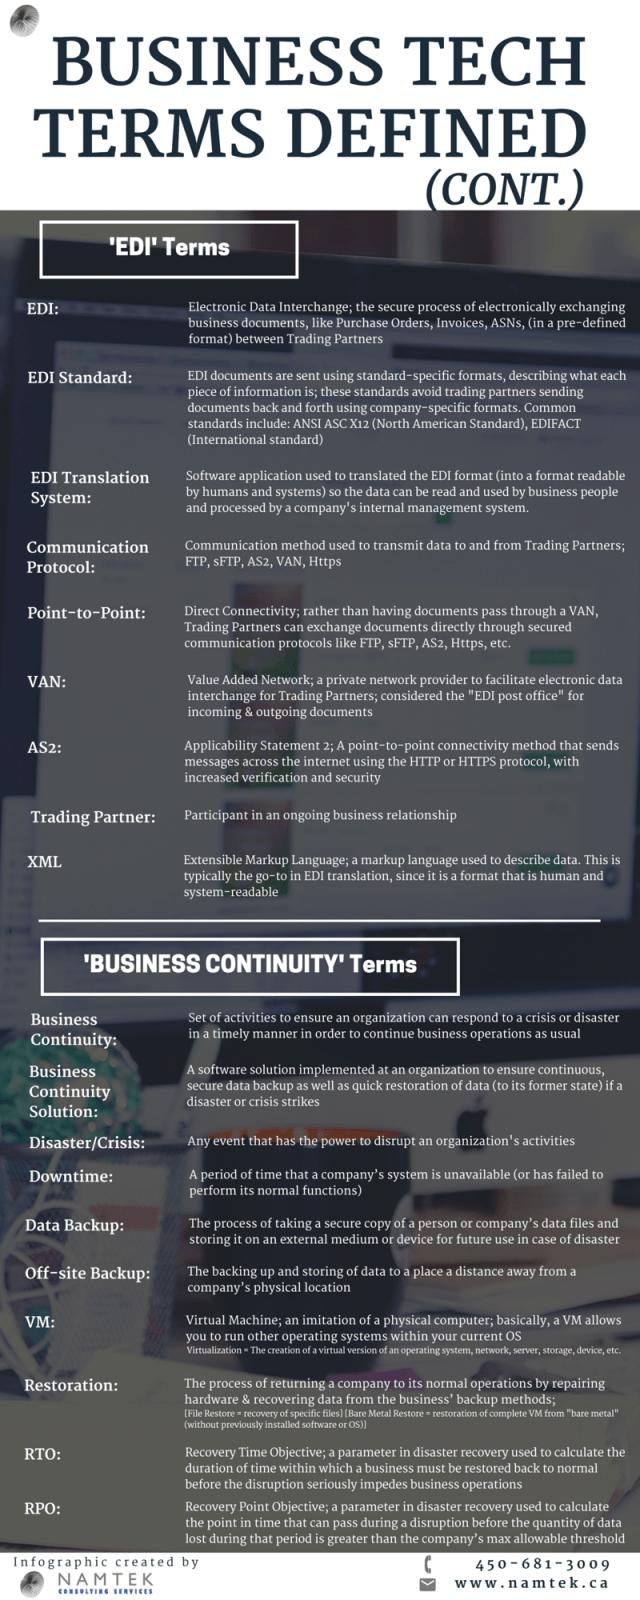 Business Tech Terms_2